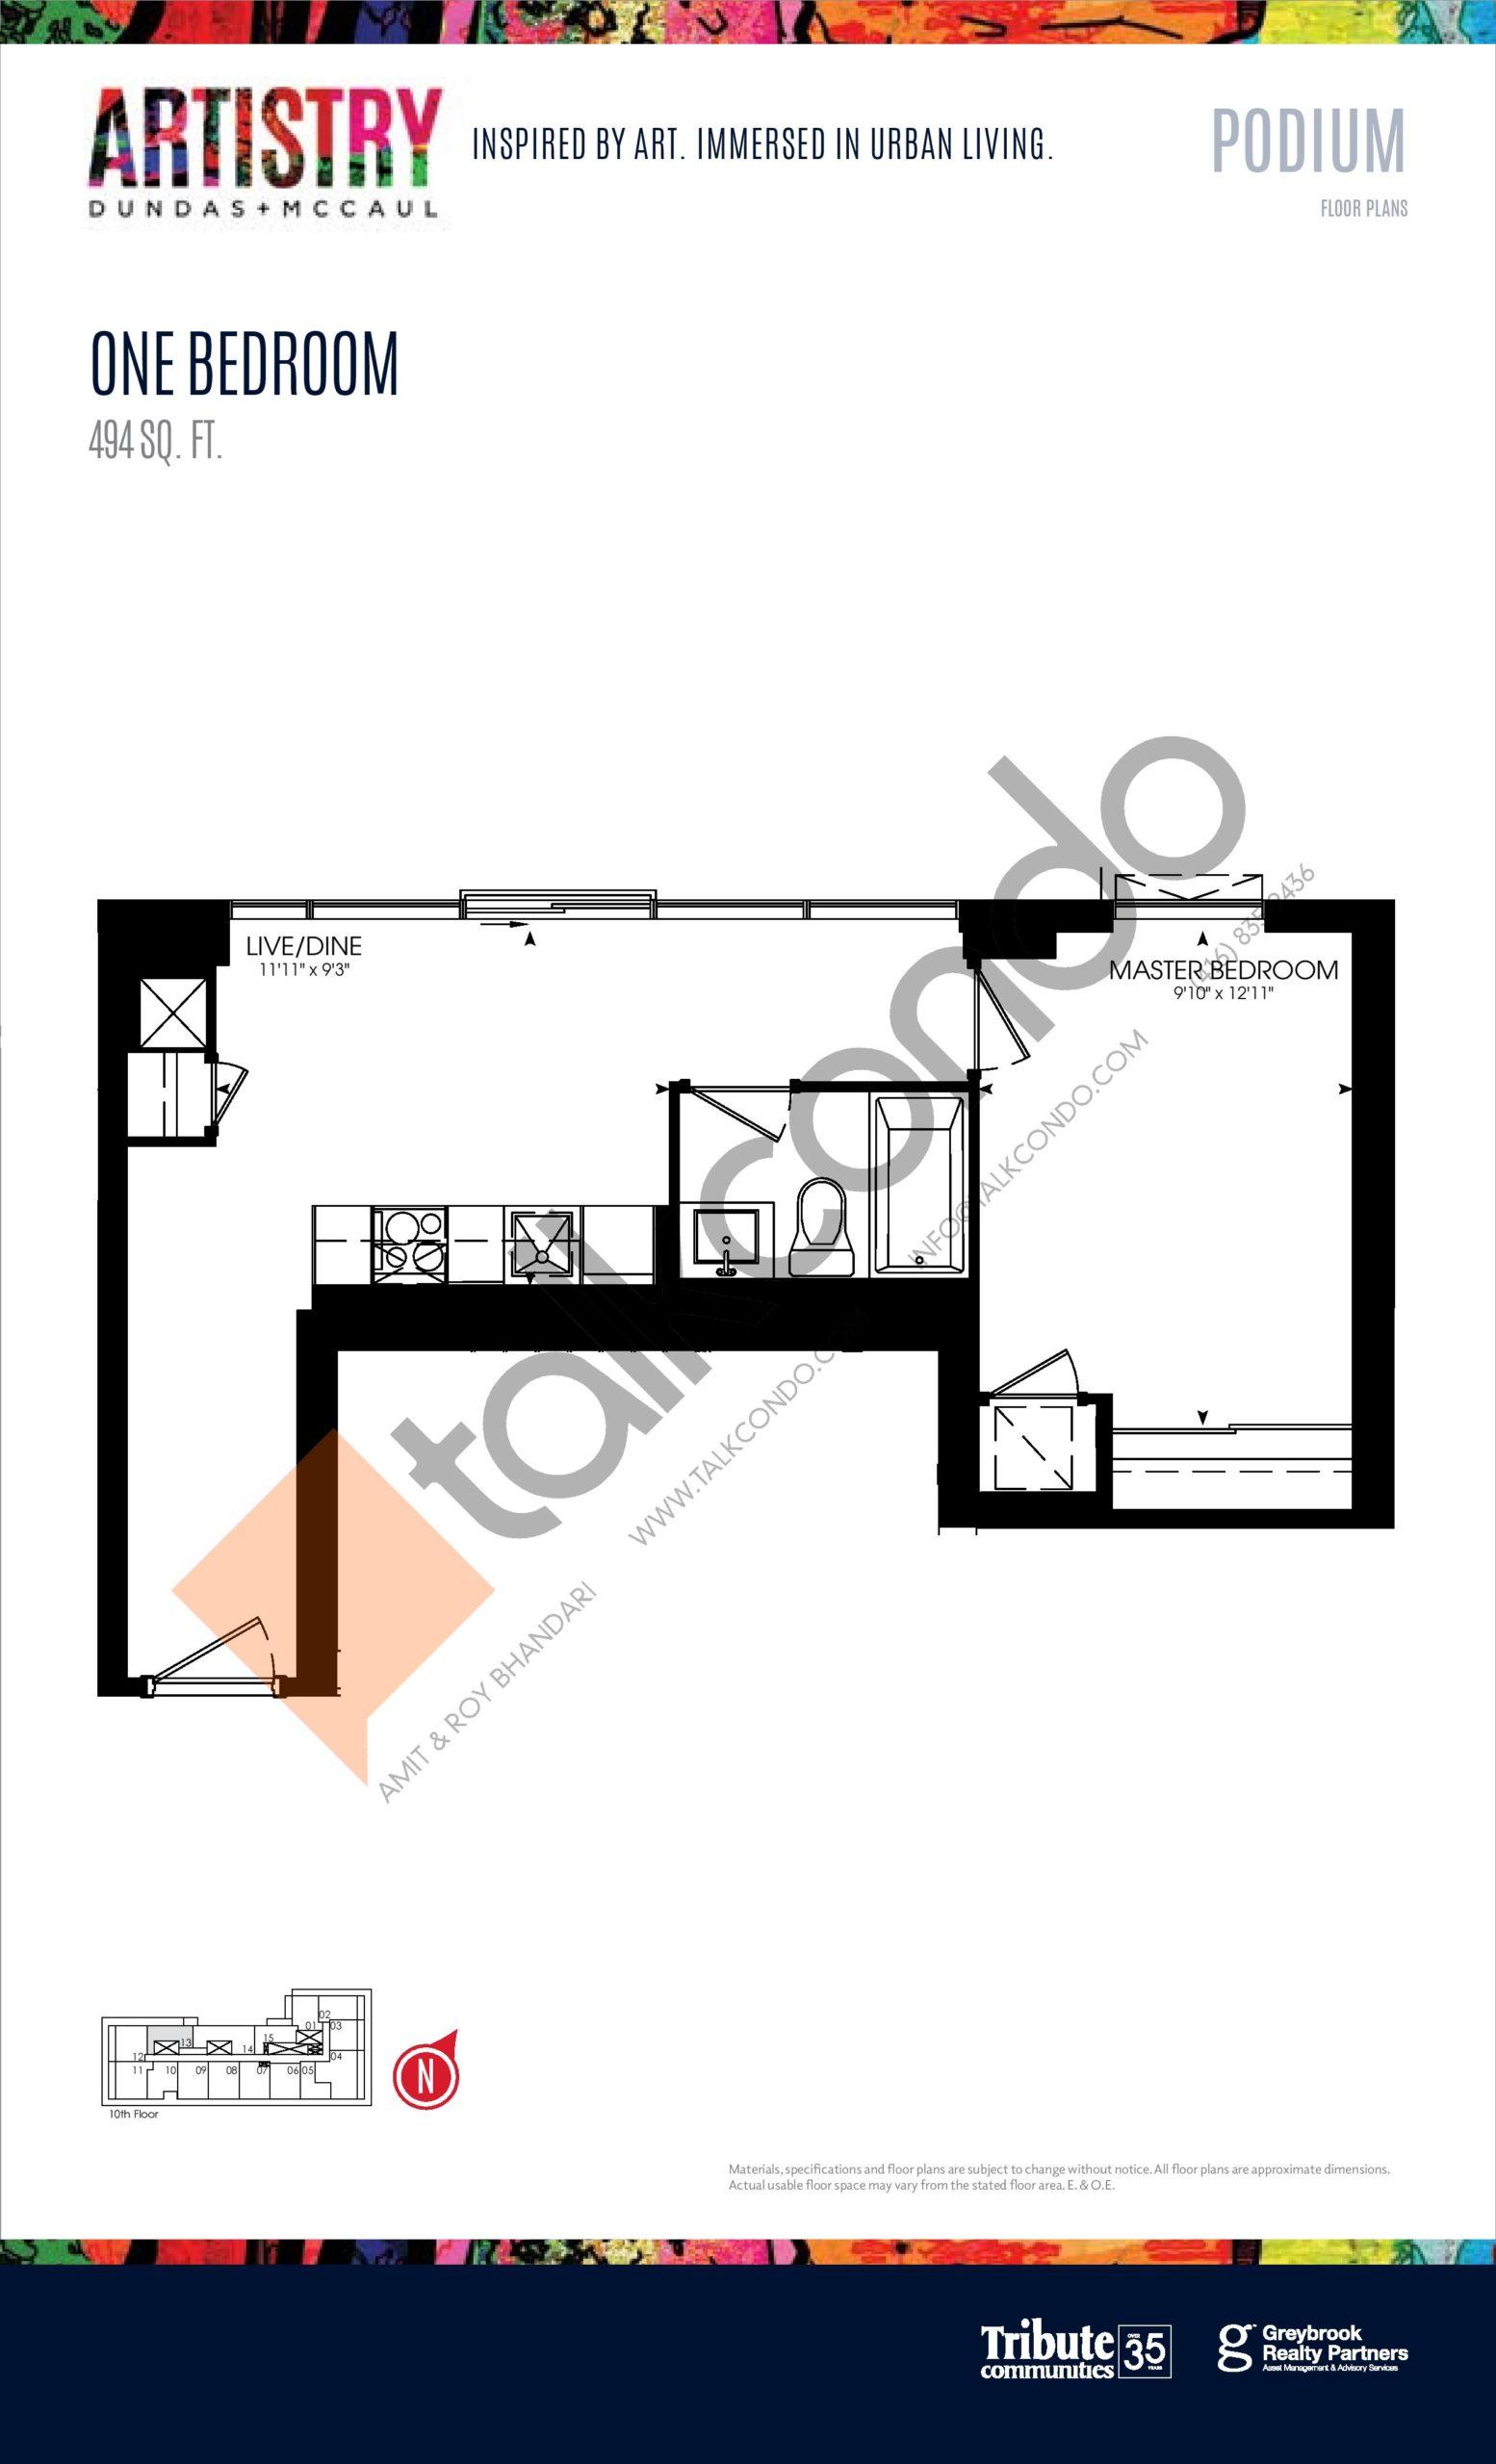 494 sq. ft. - Podium Floor Plan at Artistry Condos - 494 sq.ft